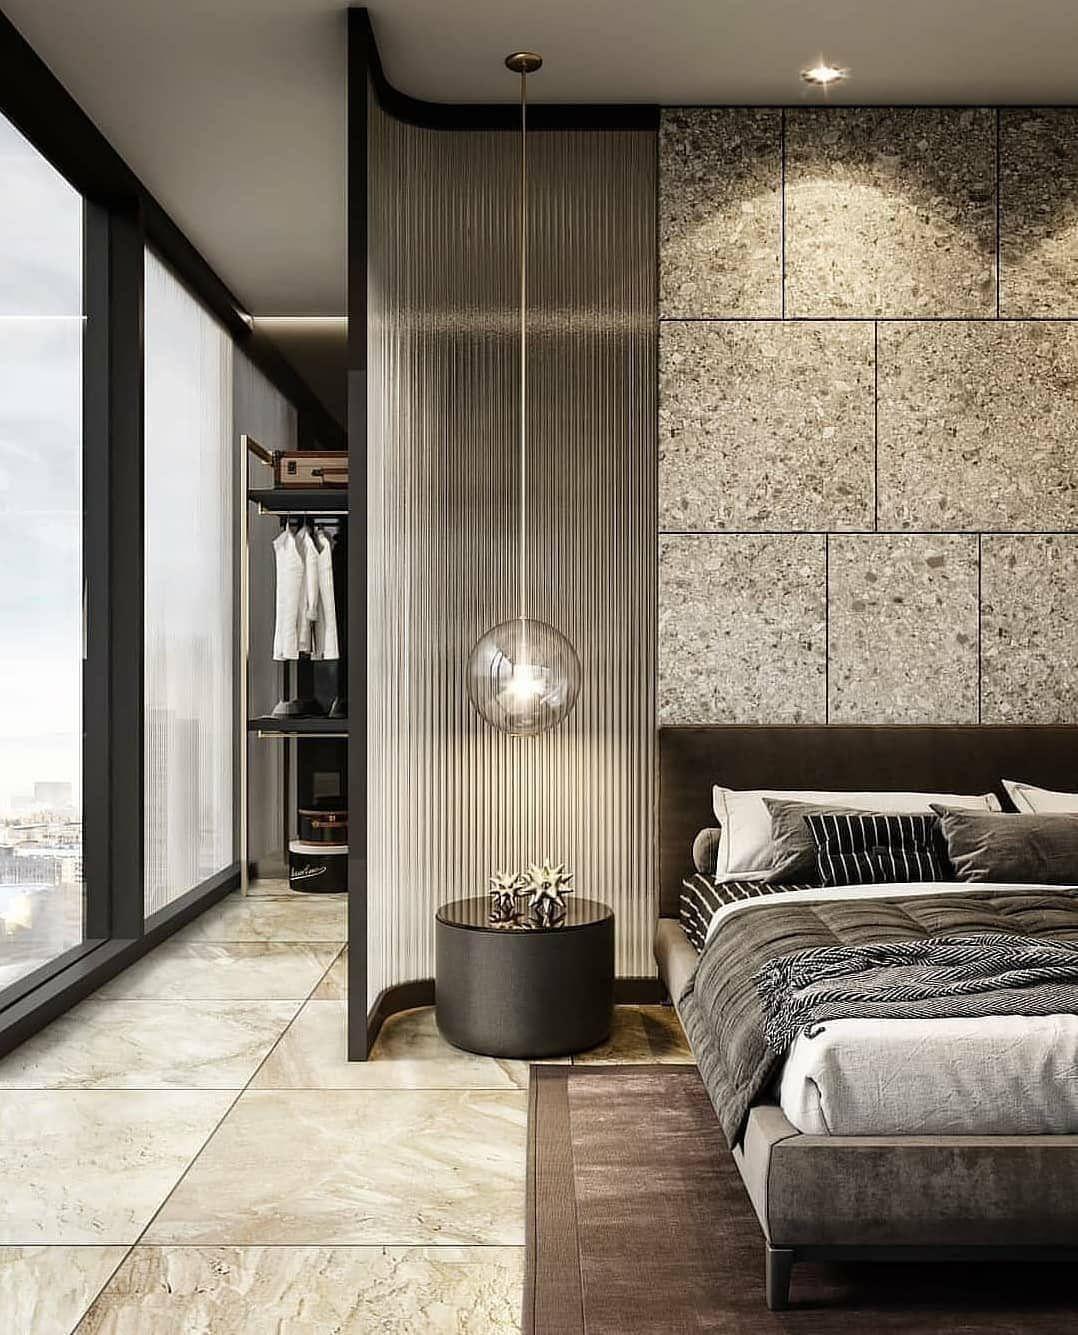 Mimari Dekorasyon On Twitter Luxurious Bedrooms Interior Design Bedroom House Interior Interior designing bedroom photos